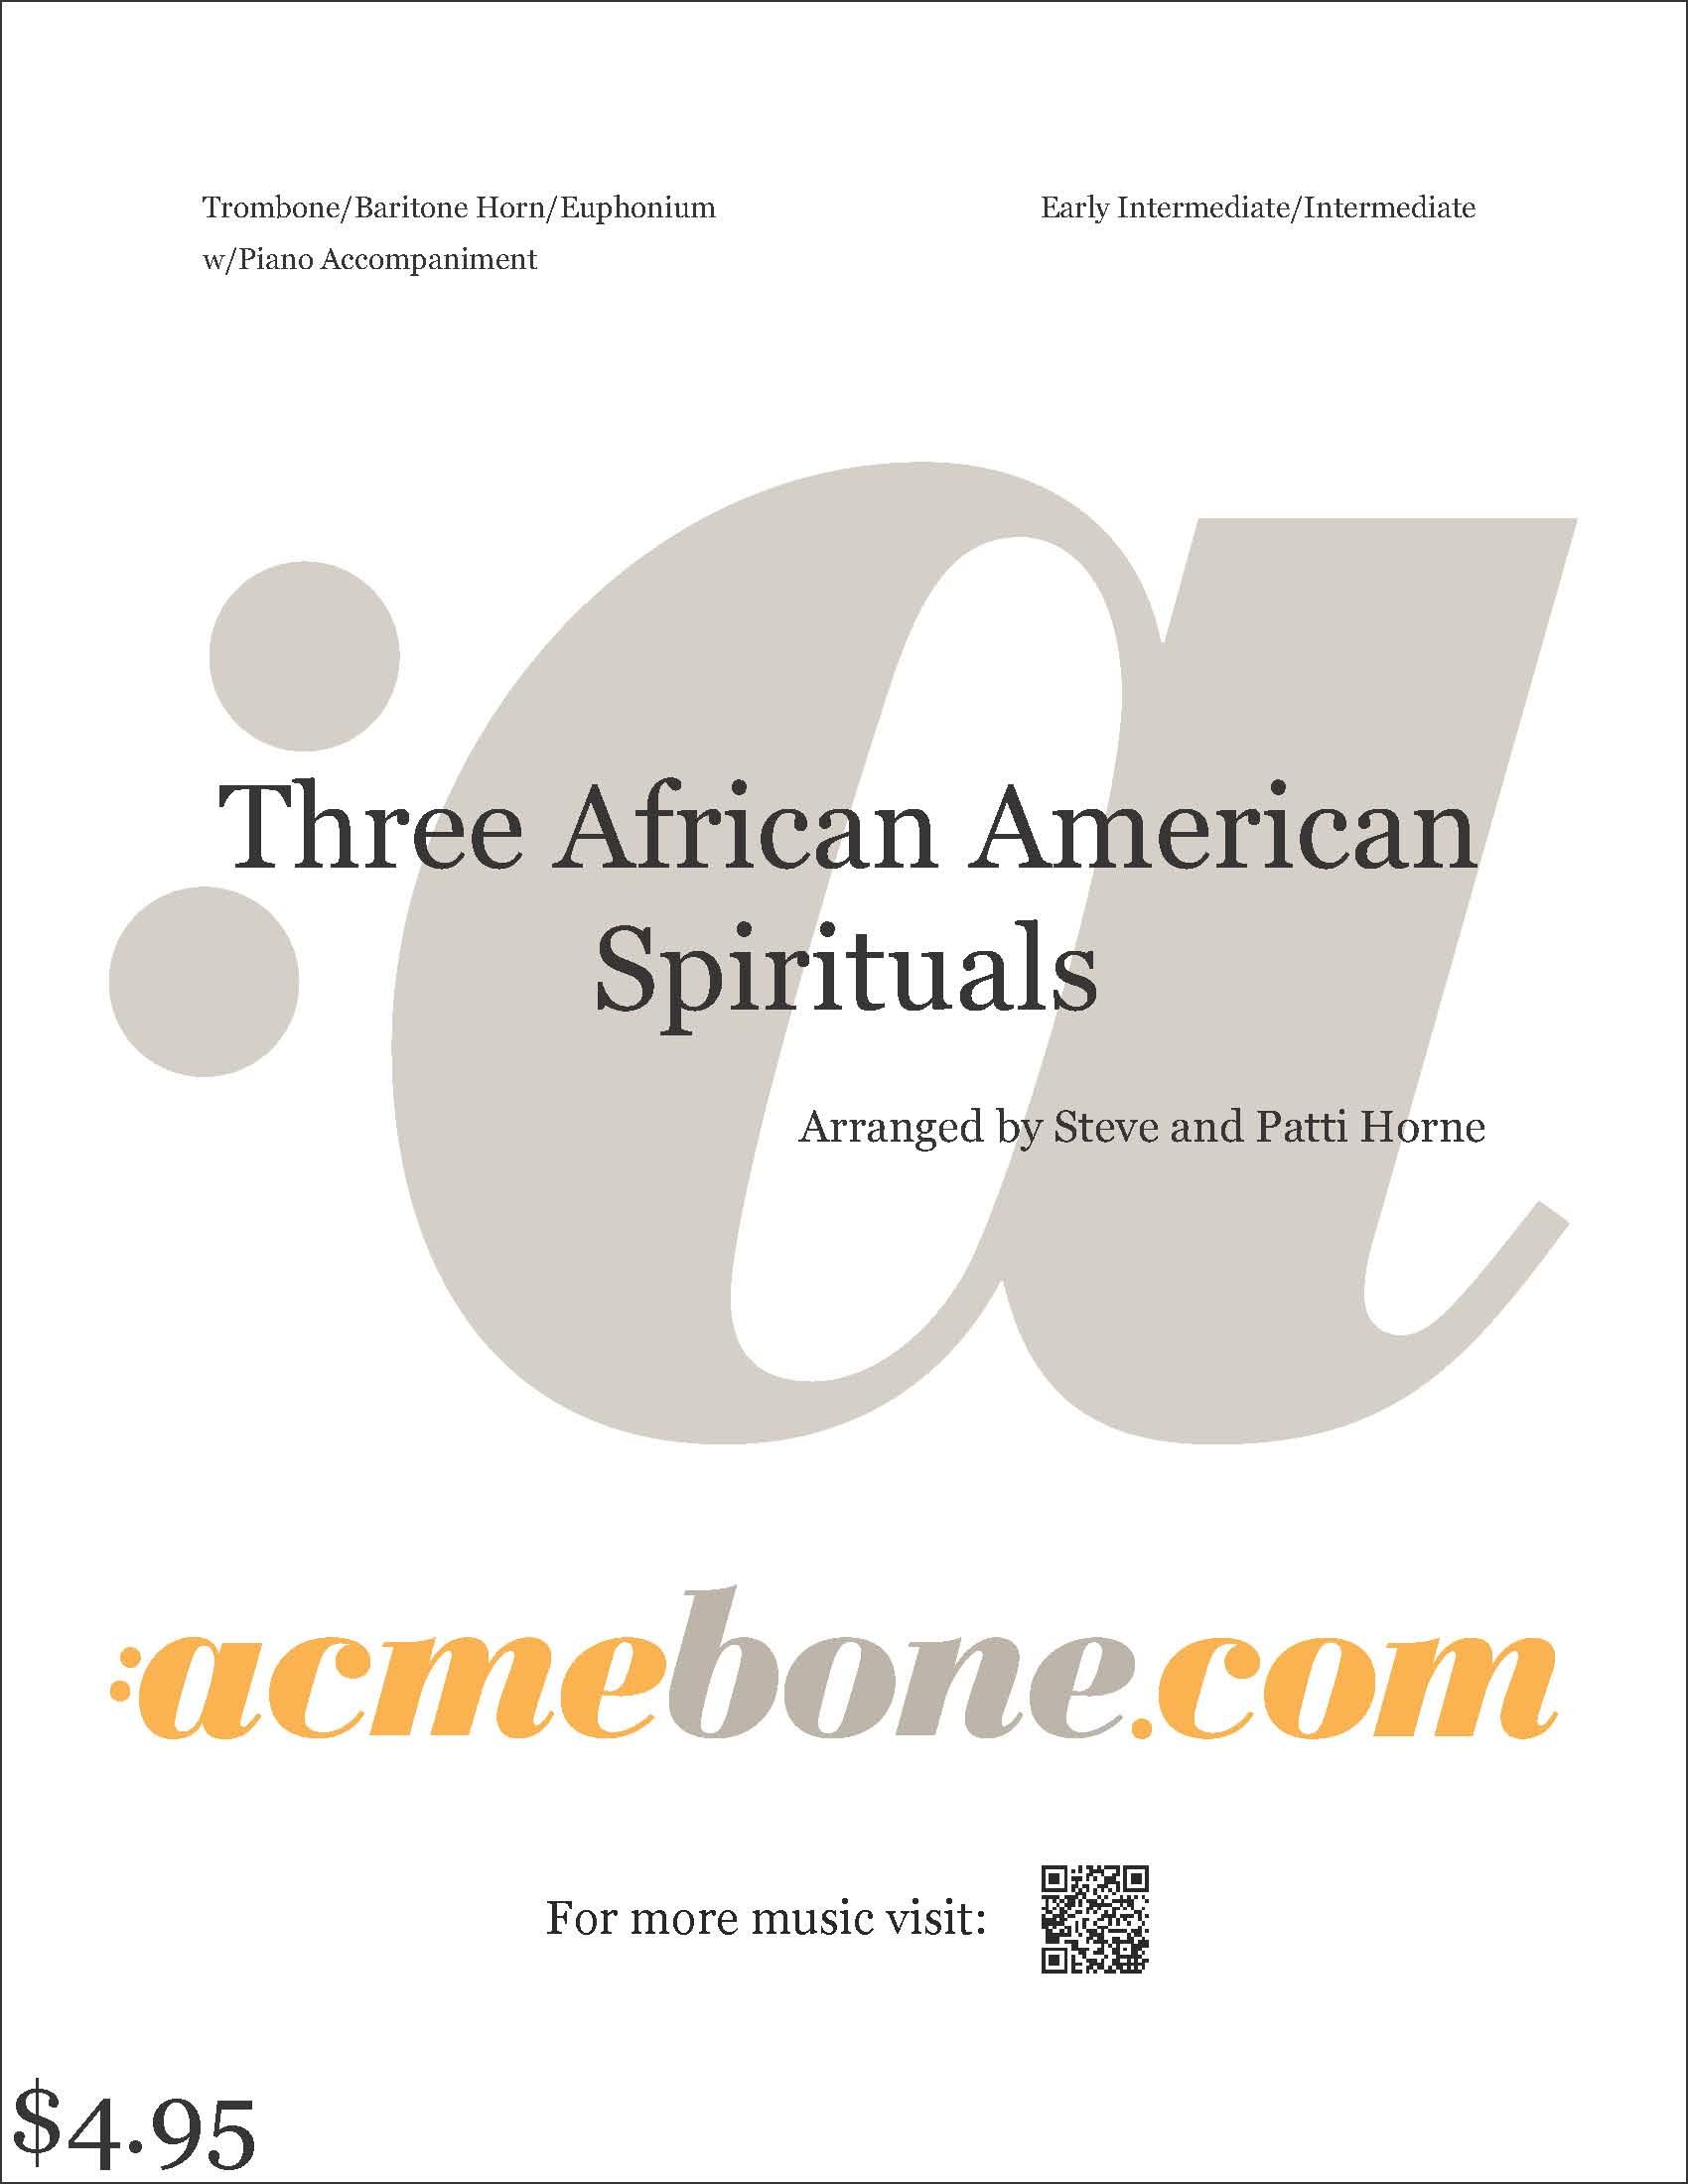 Three African American Spirituals_digital_cover_w-bo_price.jpg